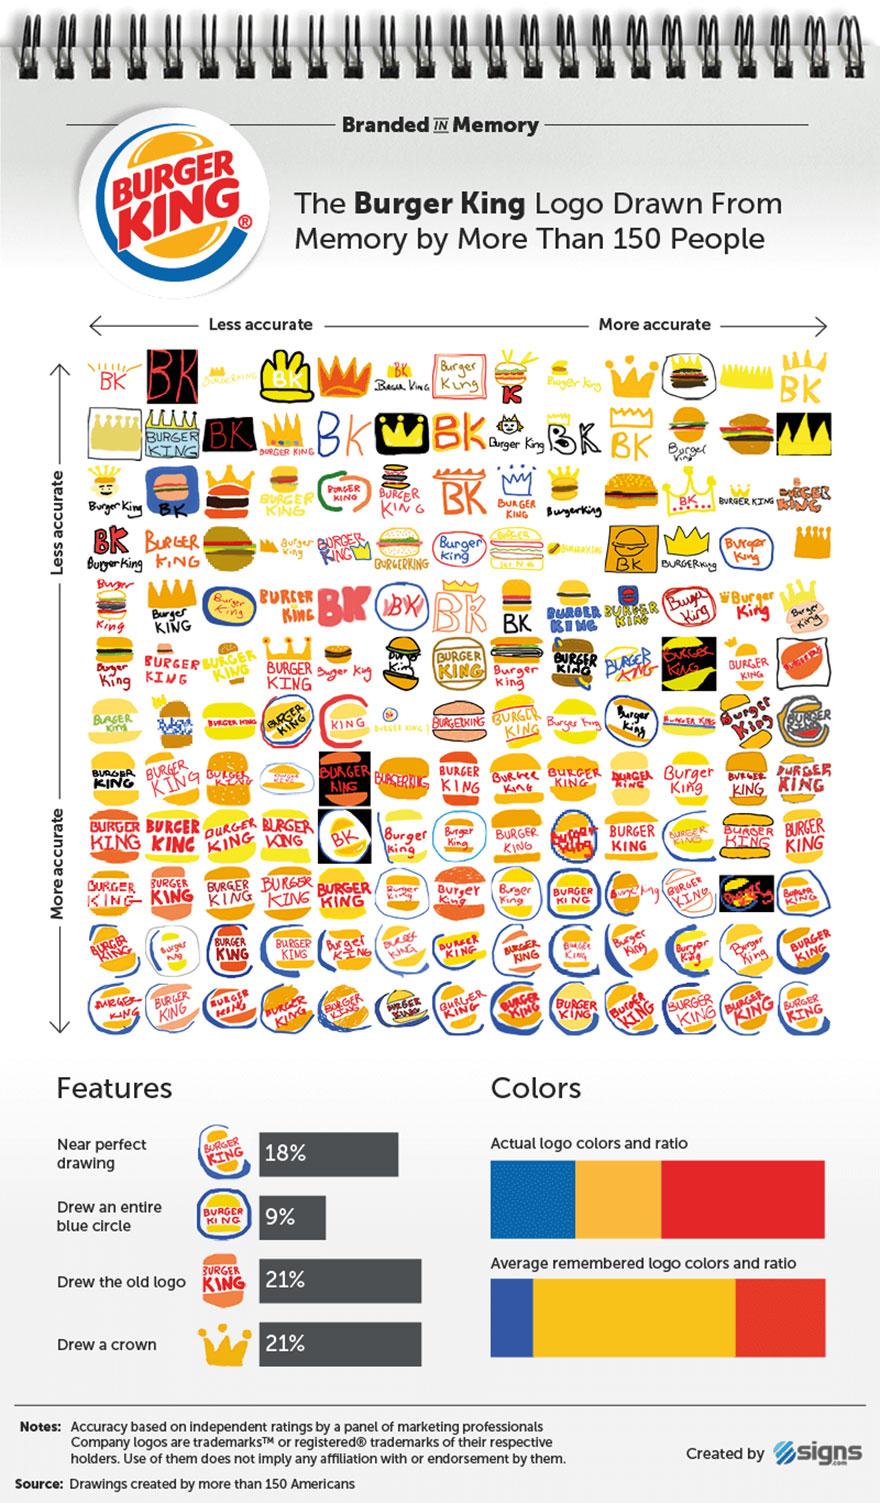 famous-brand-logos-drawn-from-memory-59d2480d22f2e__880.jpg